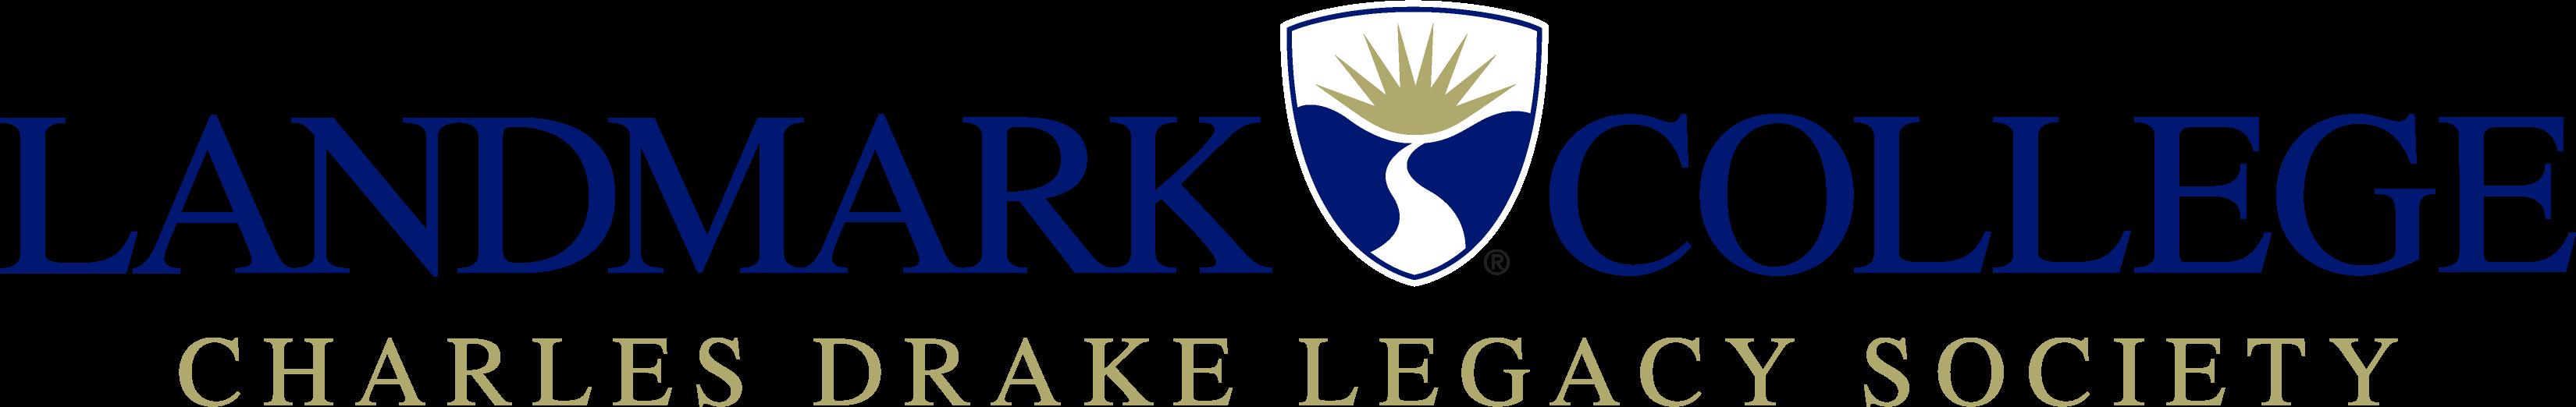 Charles Drake Legacy Society logo